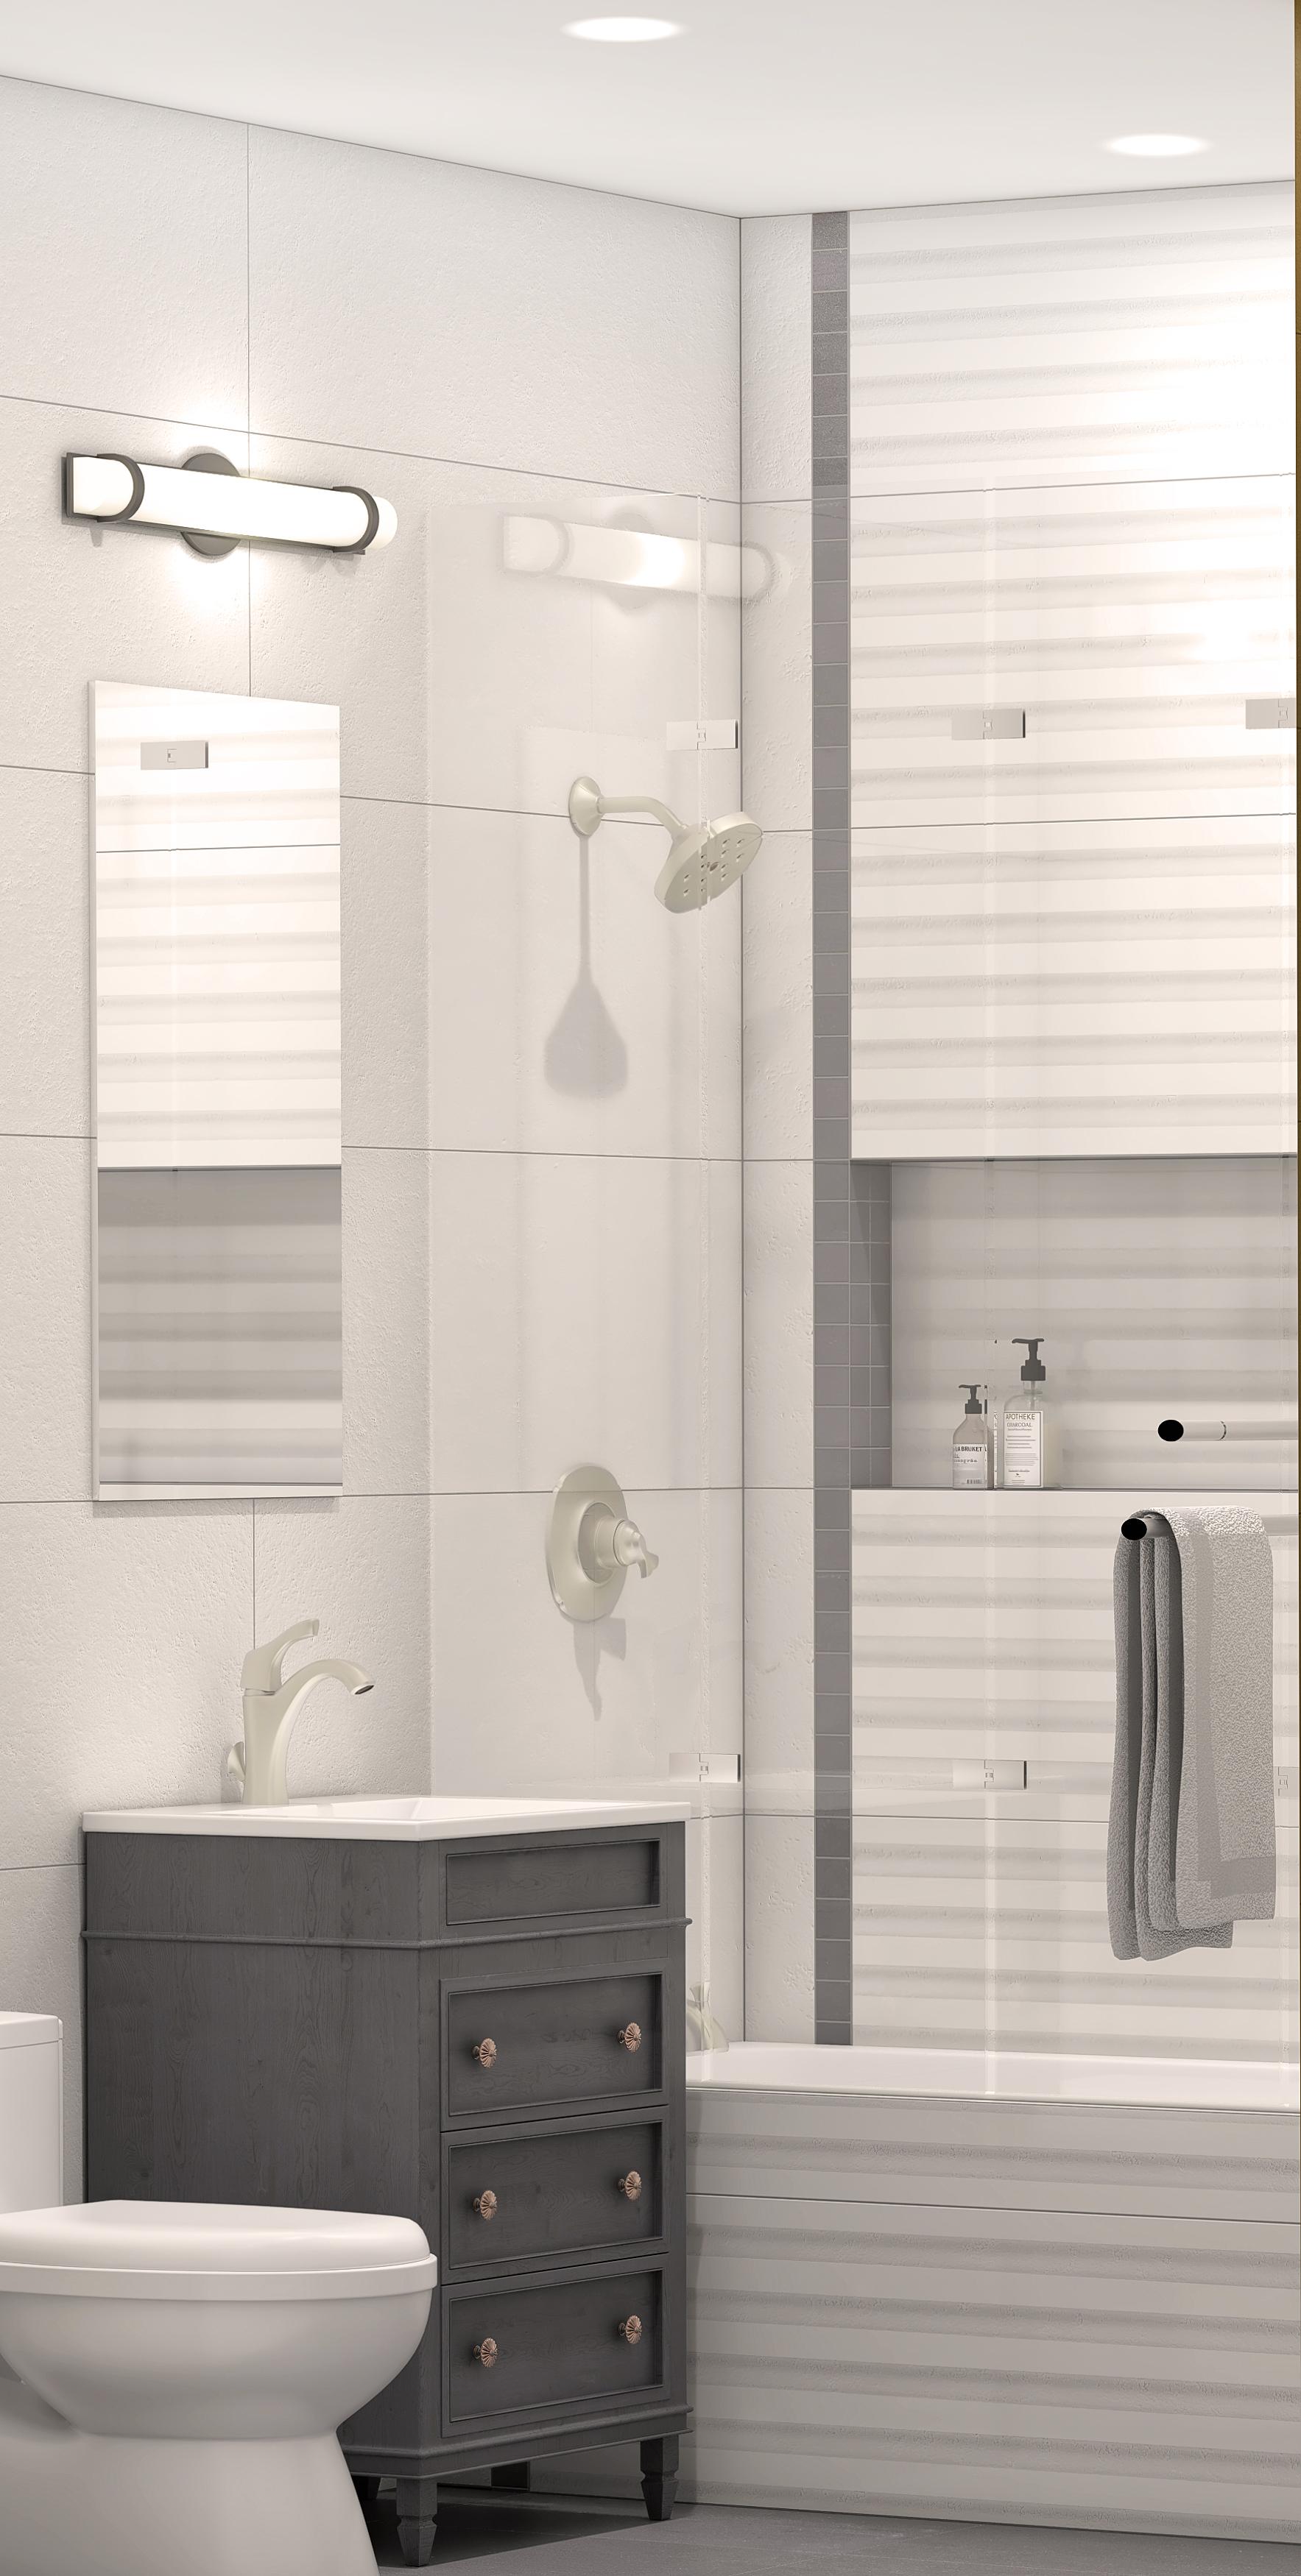 13-bathroom-85-01.0006-300 dpi-edit.jpg